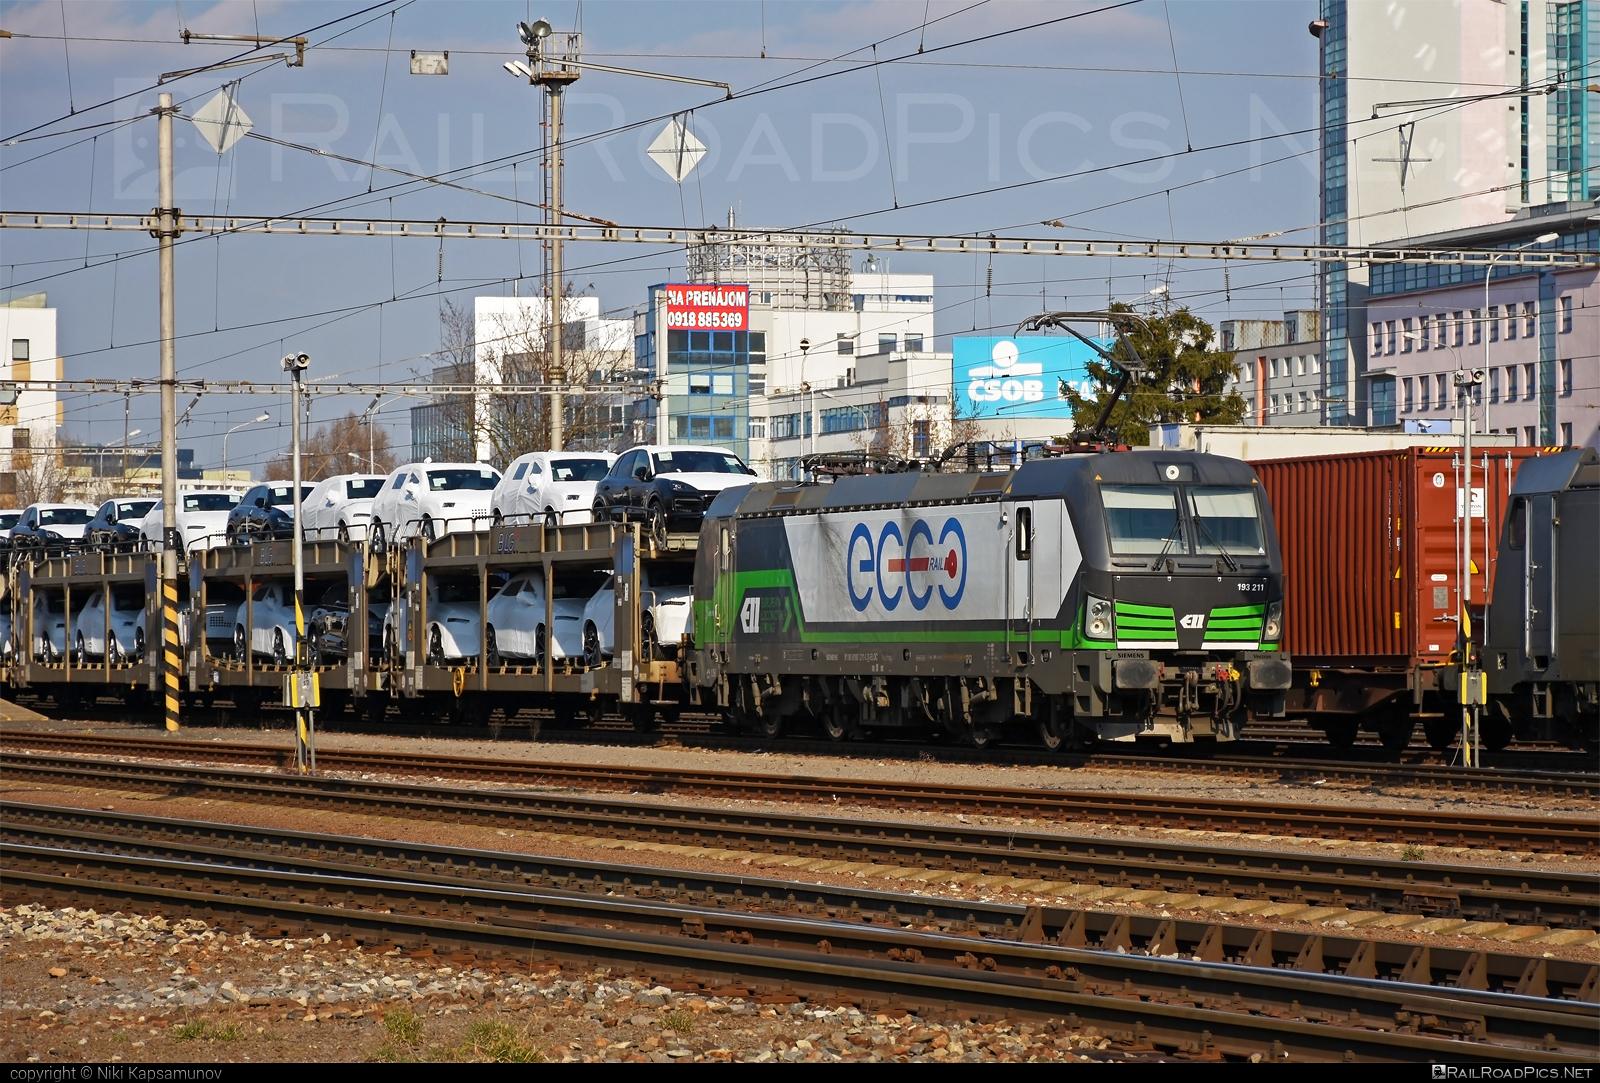 Siemens Vectron AC - 193 211 operated by ecco-rail GmbH #carcarrierwagon #eccorail #eccorailgmbh #ell #ellgermany #eloc #europeanlocomotiveleasing #siemens #siemensvectron #siemensvectronac #vectron #vectronac